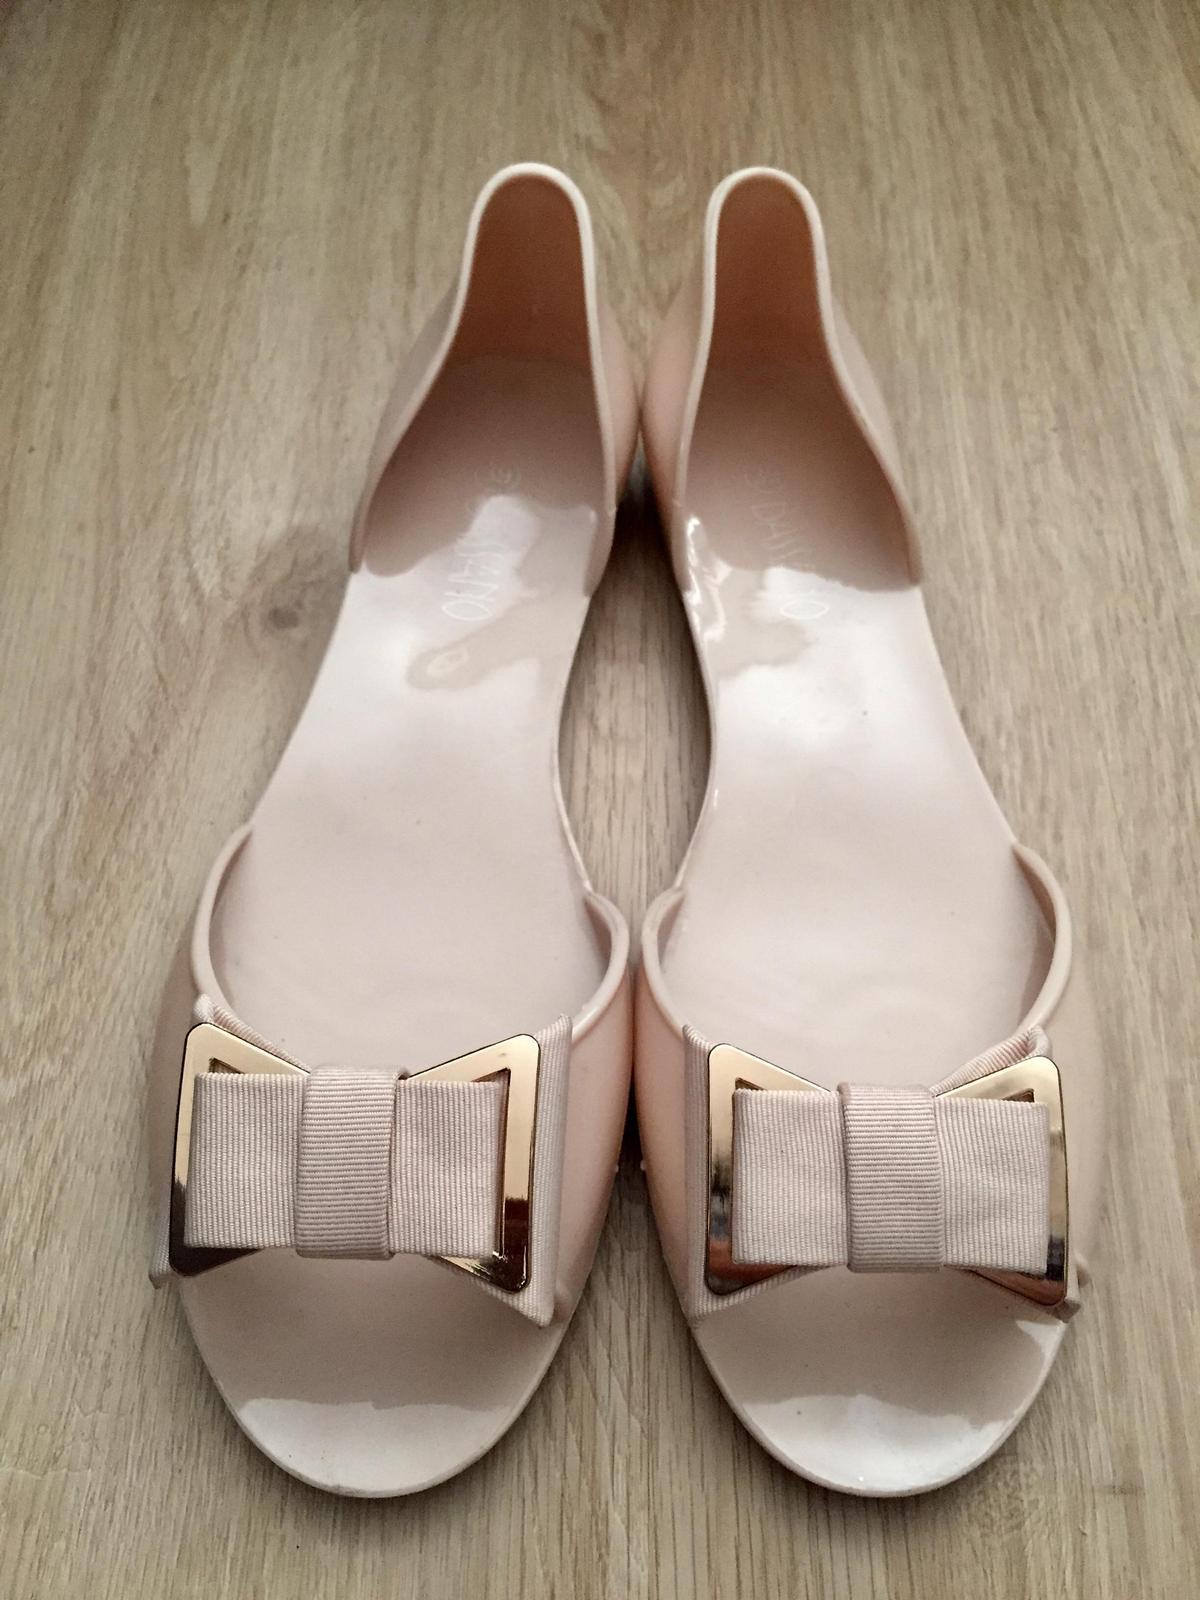 Sandále s otvorenou špičkou, 1x obuté - Obrázok č. 3